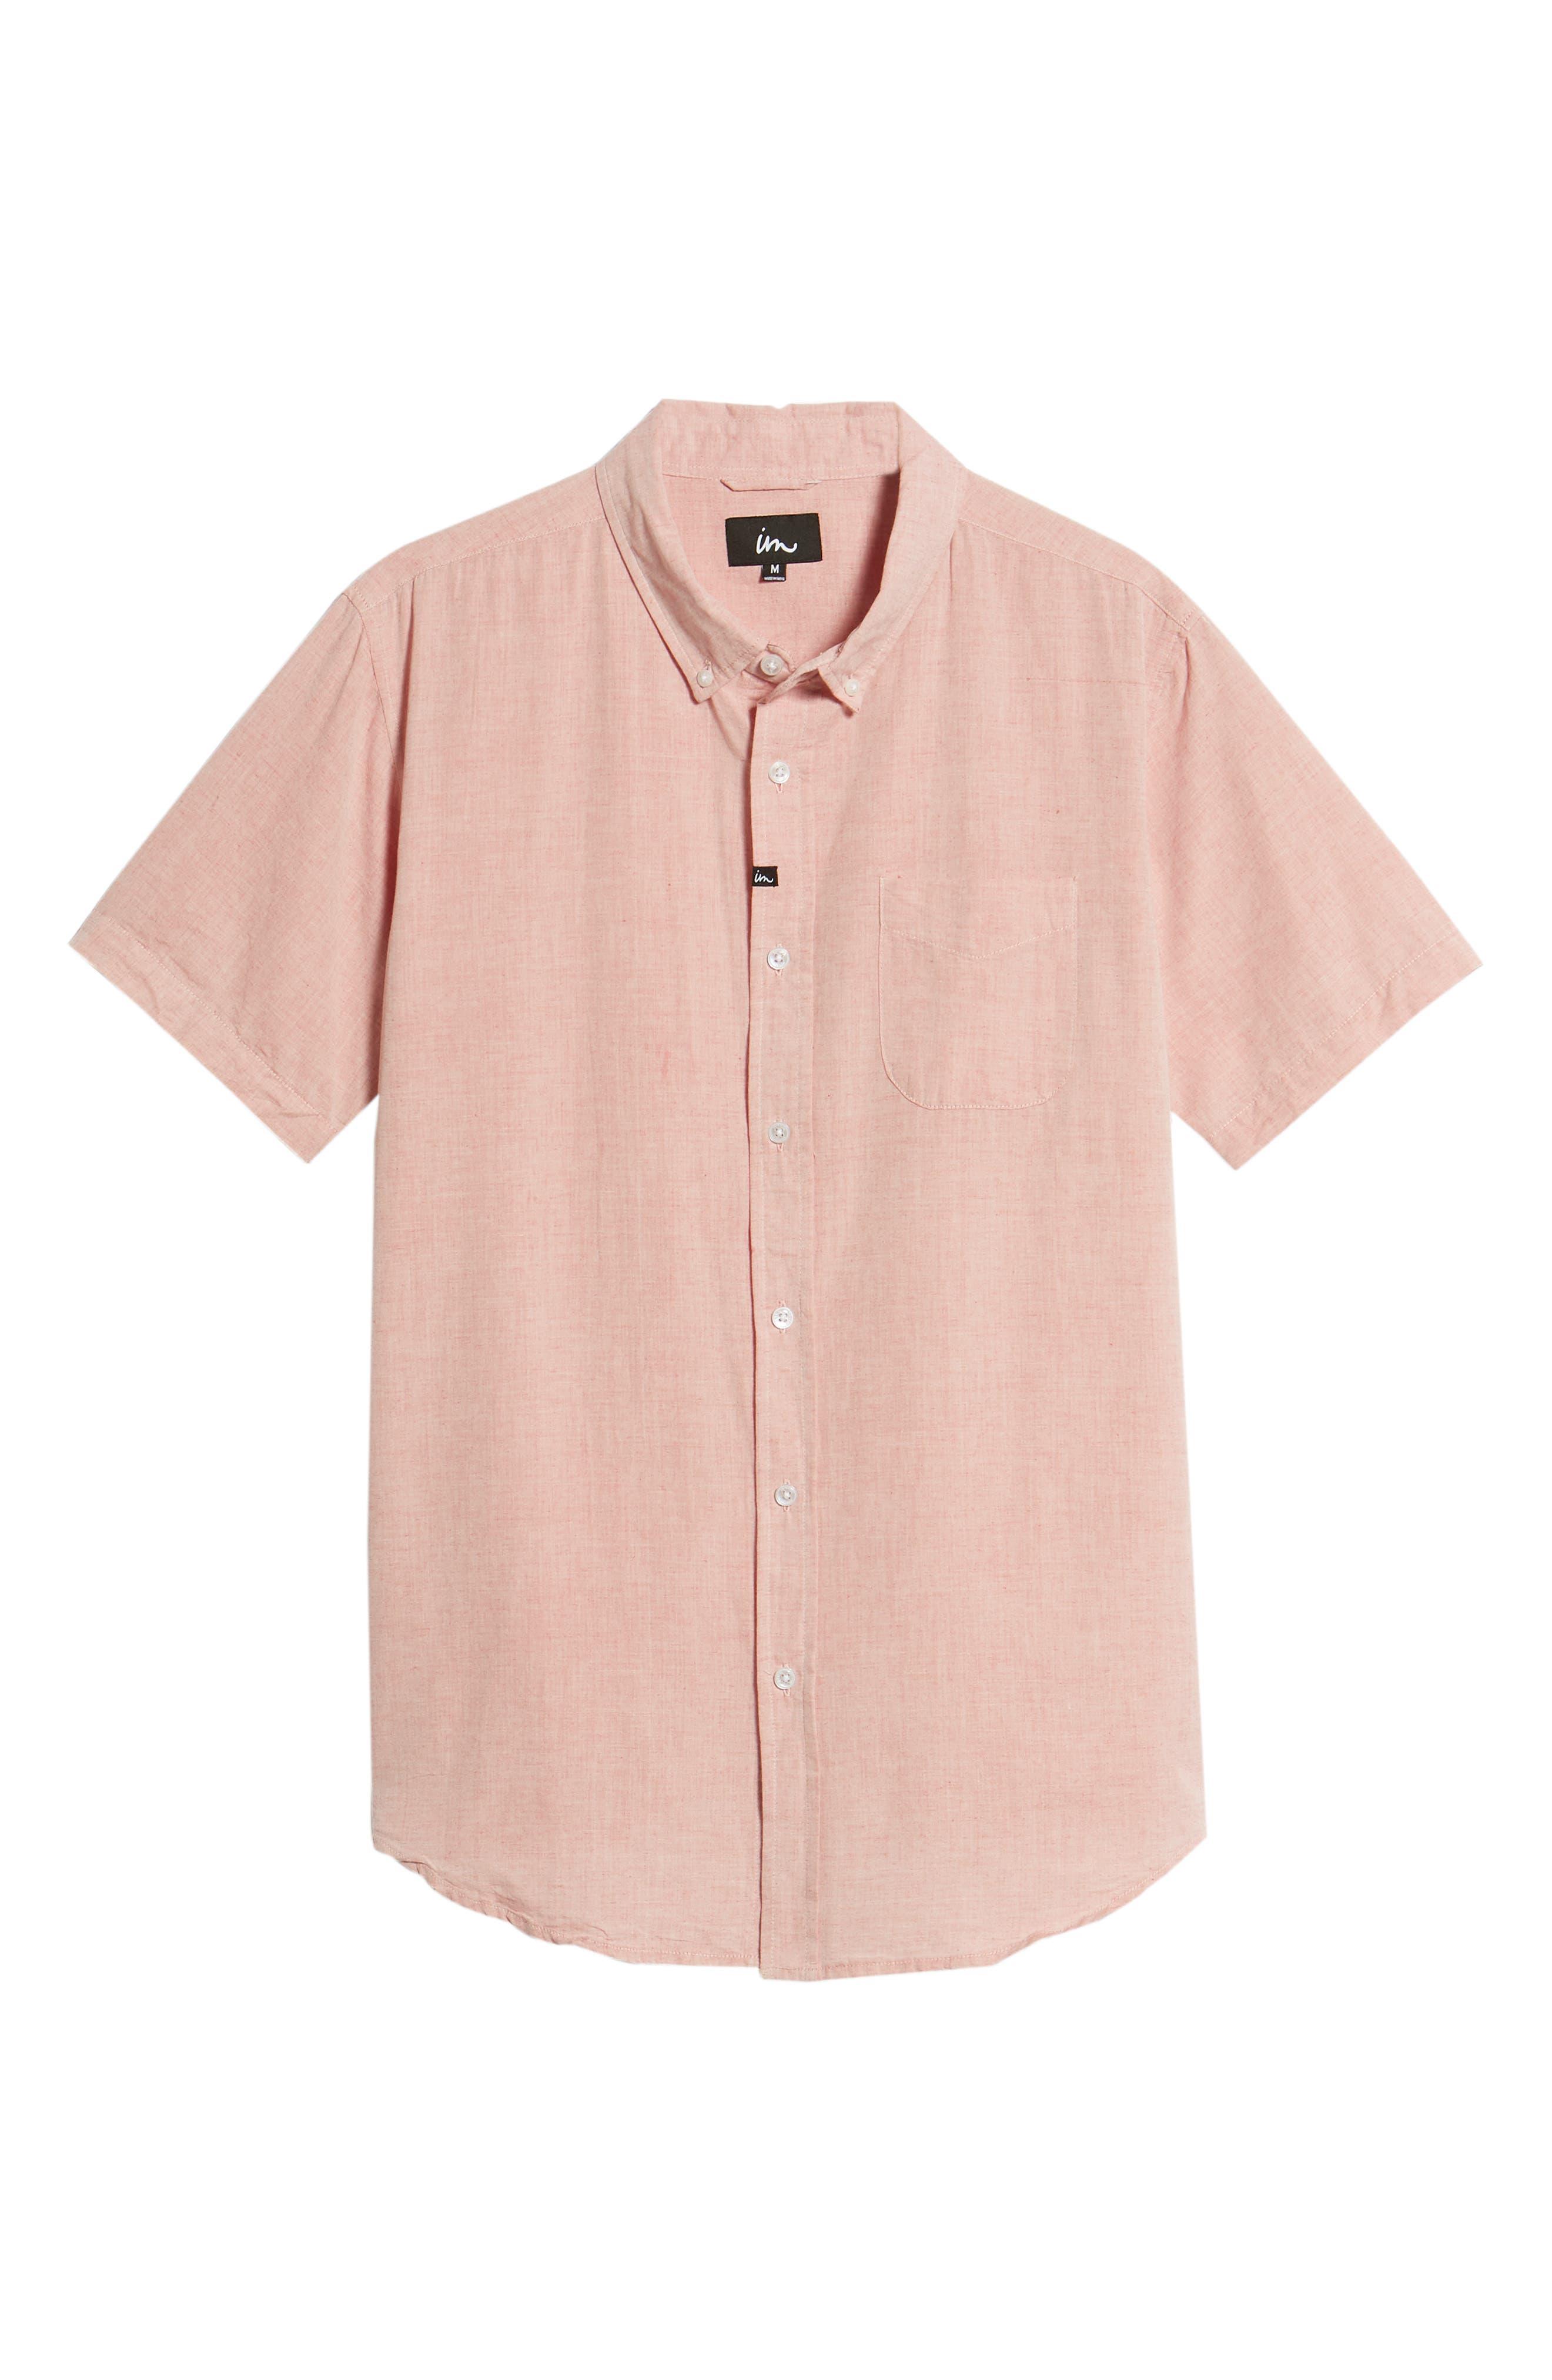 Triumph Woven Shirt,                             Alternate thumbnail 6, color,                             Mahogany